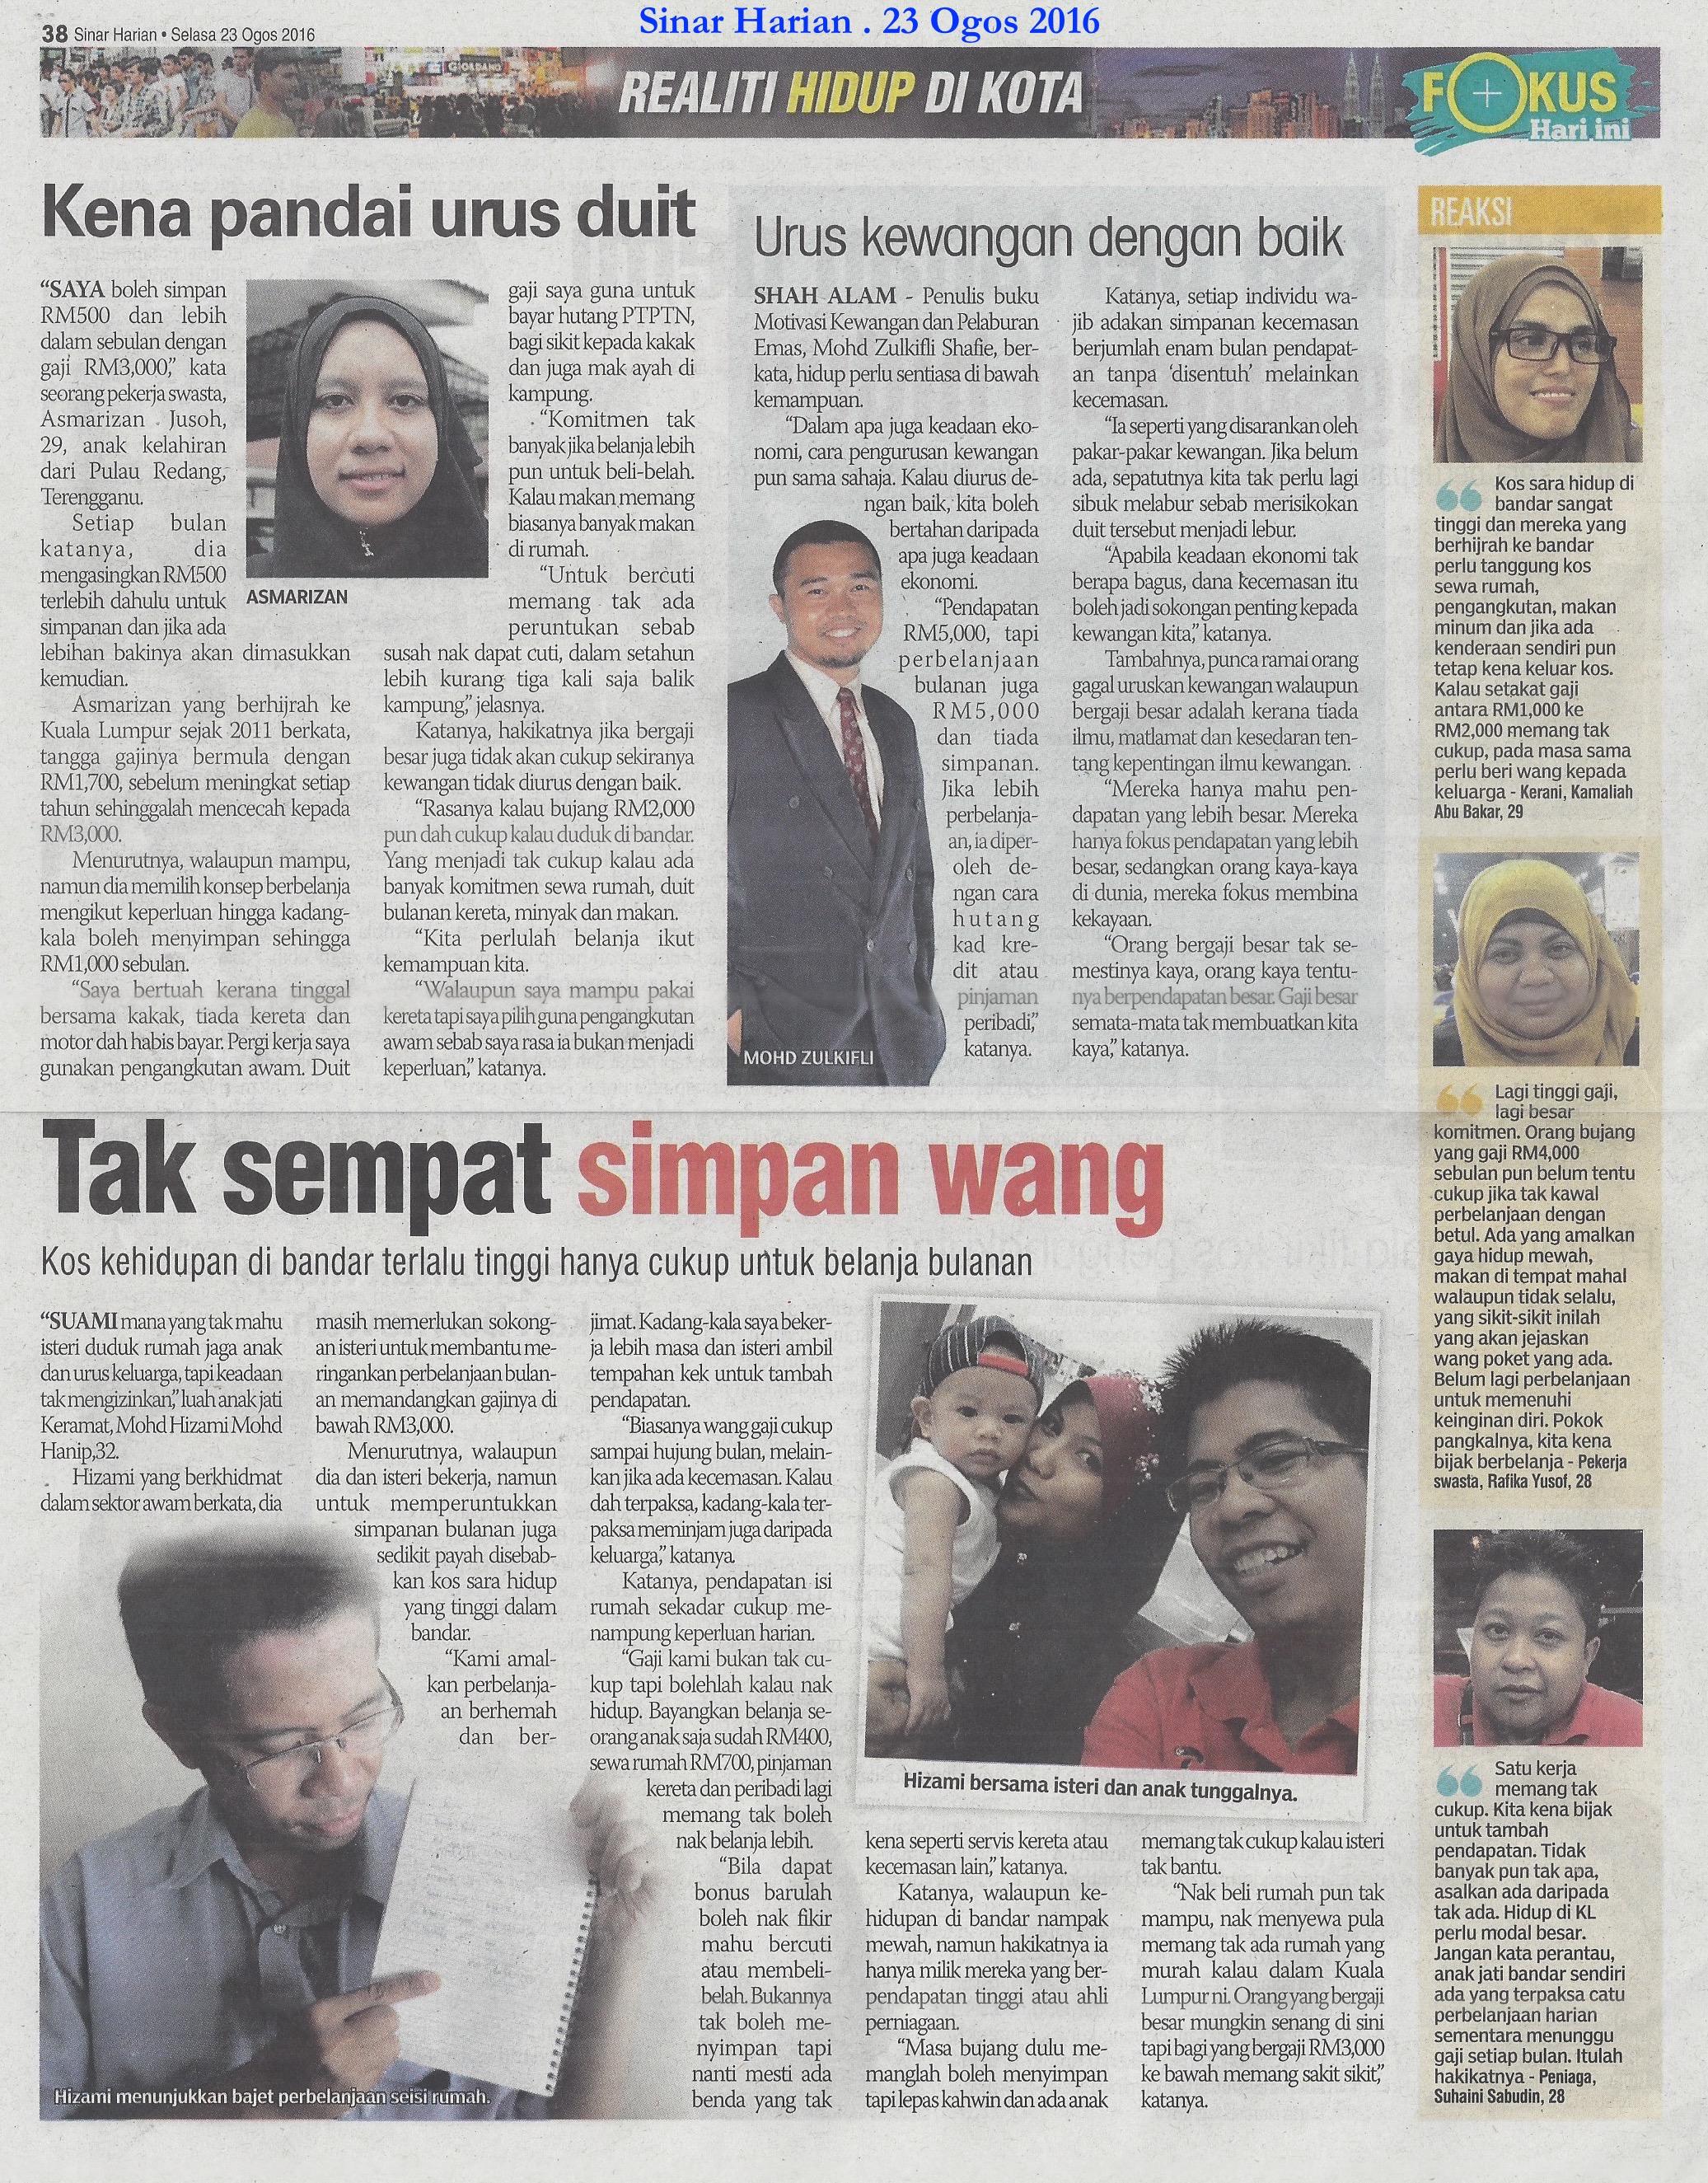 Sinar Harian 20160823 Mohd Zulkifli Shafie interview